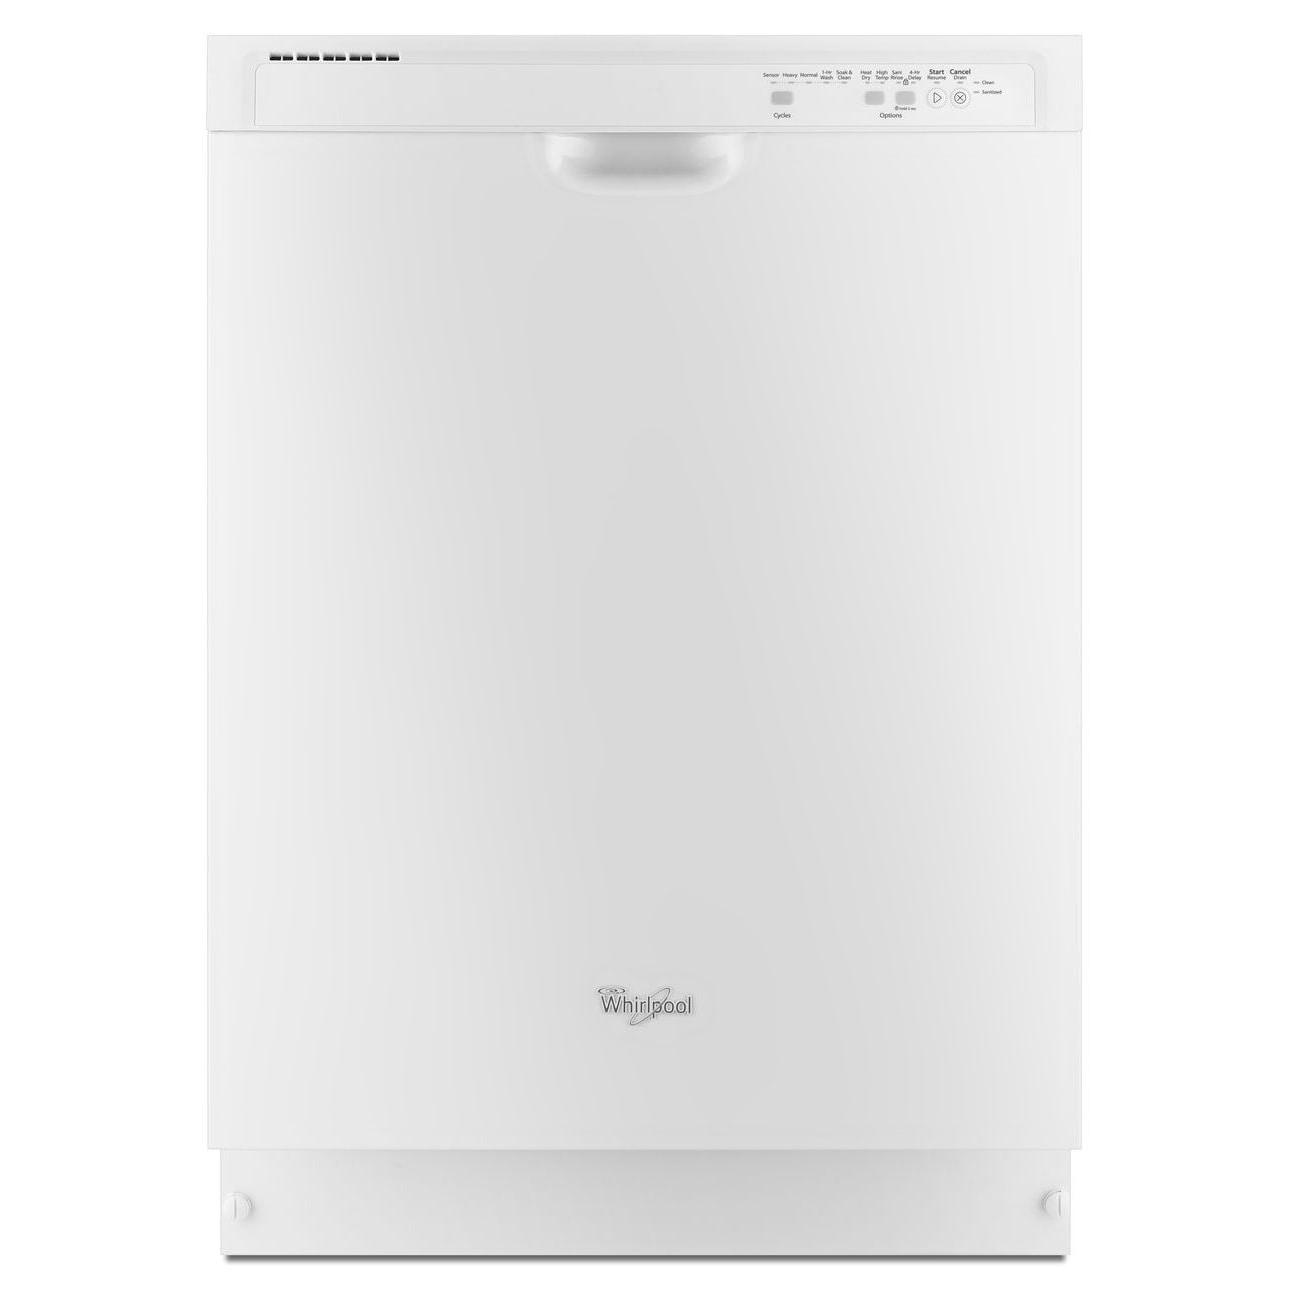 "Whirlpool White 24"" Dishwasher - WDF540PADW"